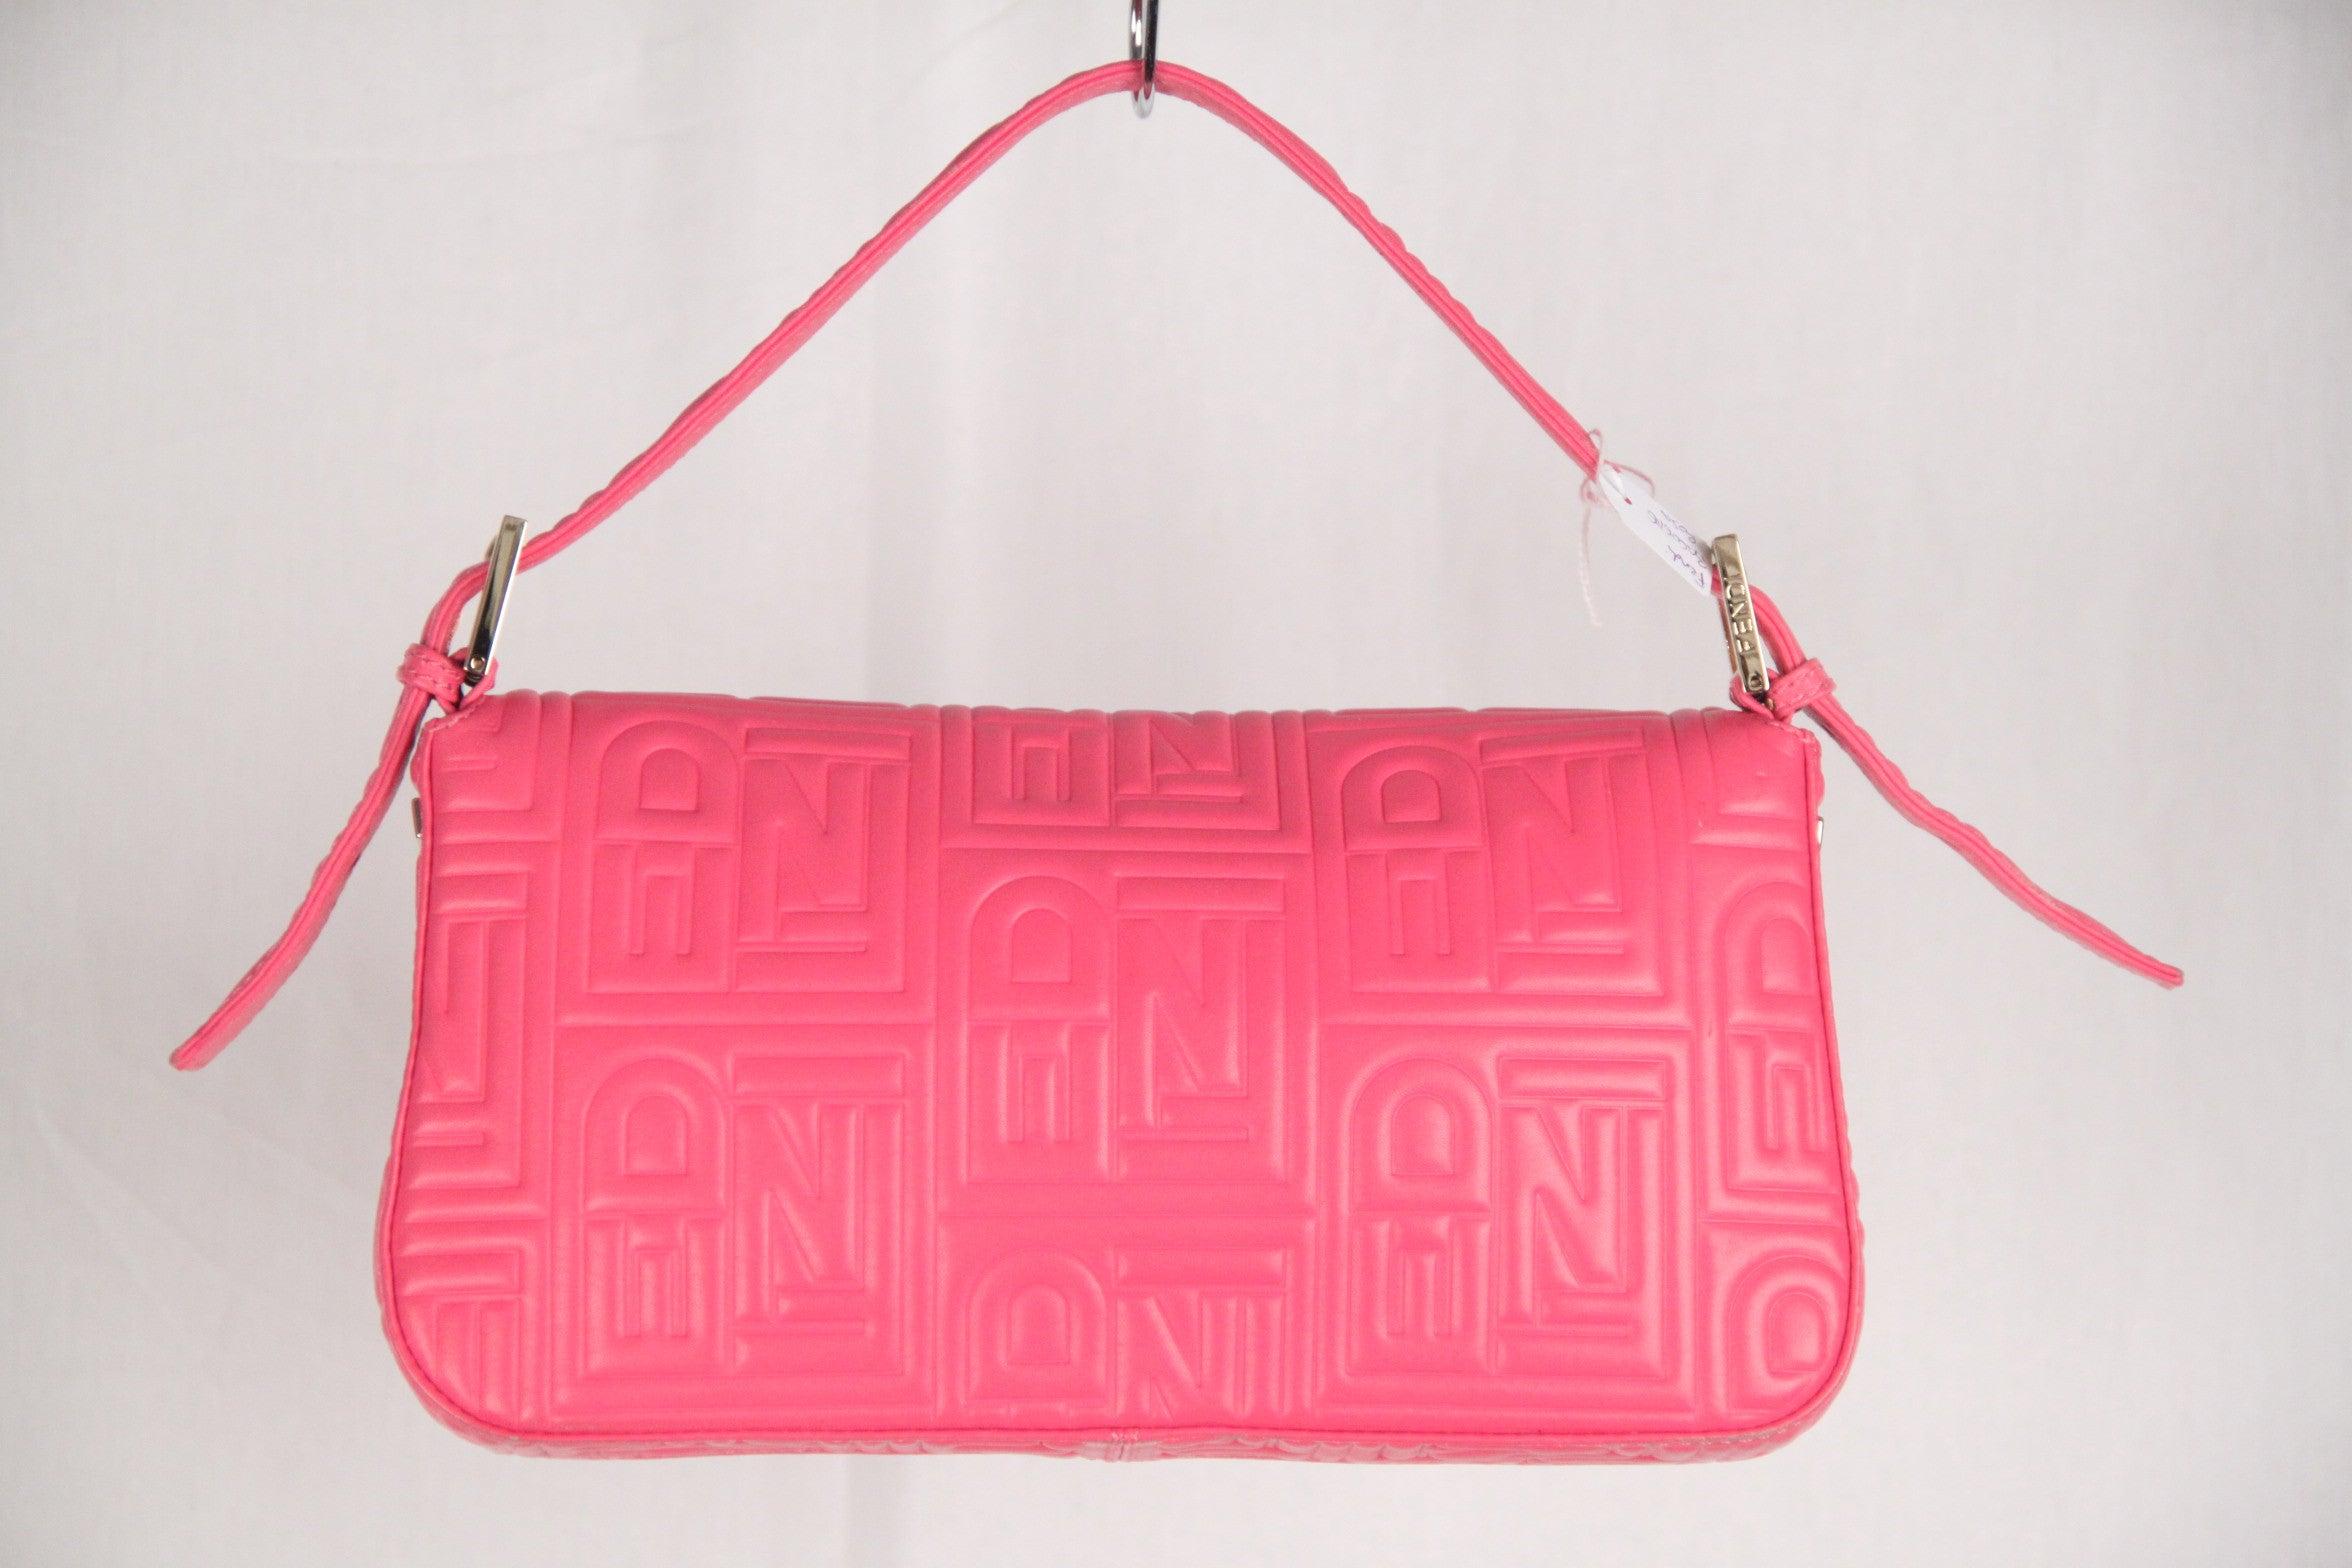 c76b7ab5d3 FENDI Pink Logo Embossed Nappa Leather BAGUETTE BAG For Sale at 1stdibs